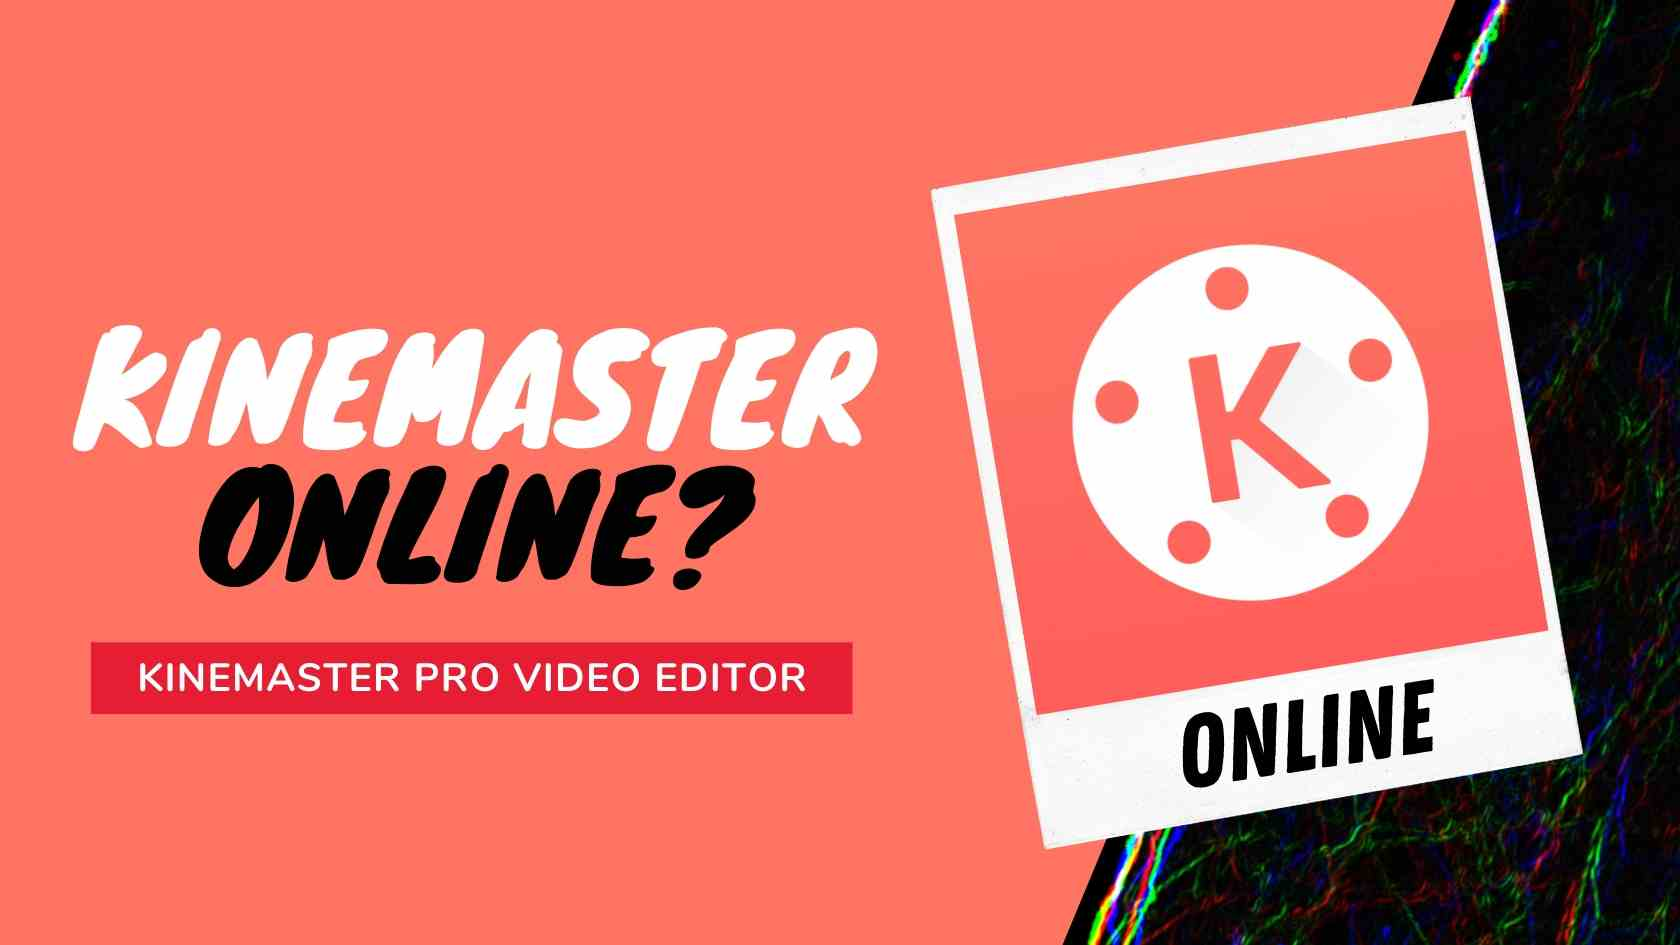 kinemaster online pc